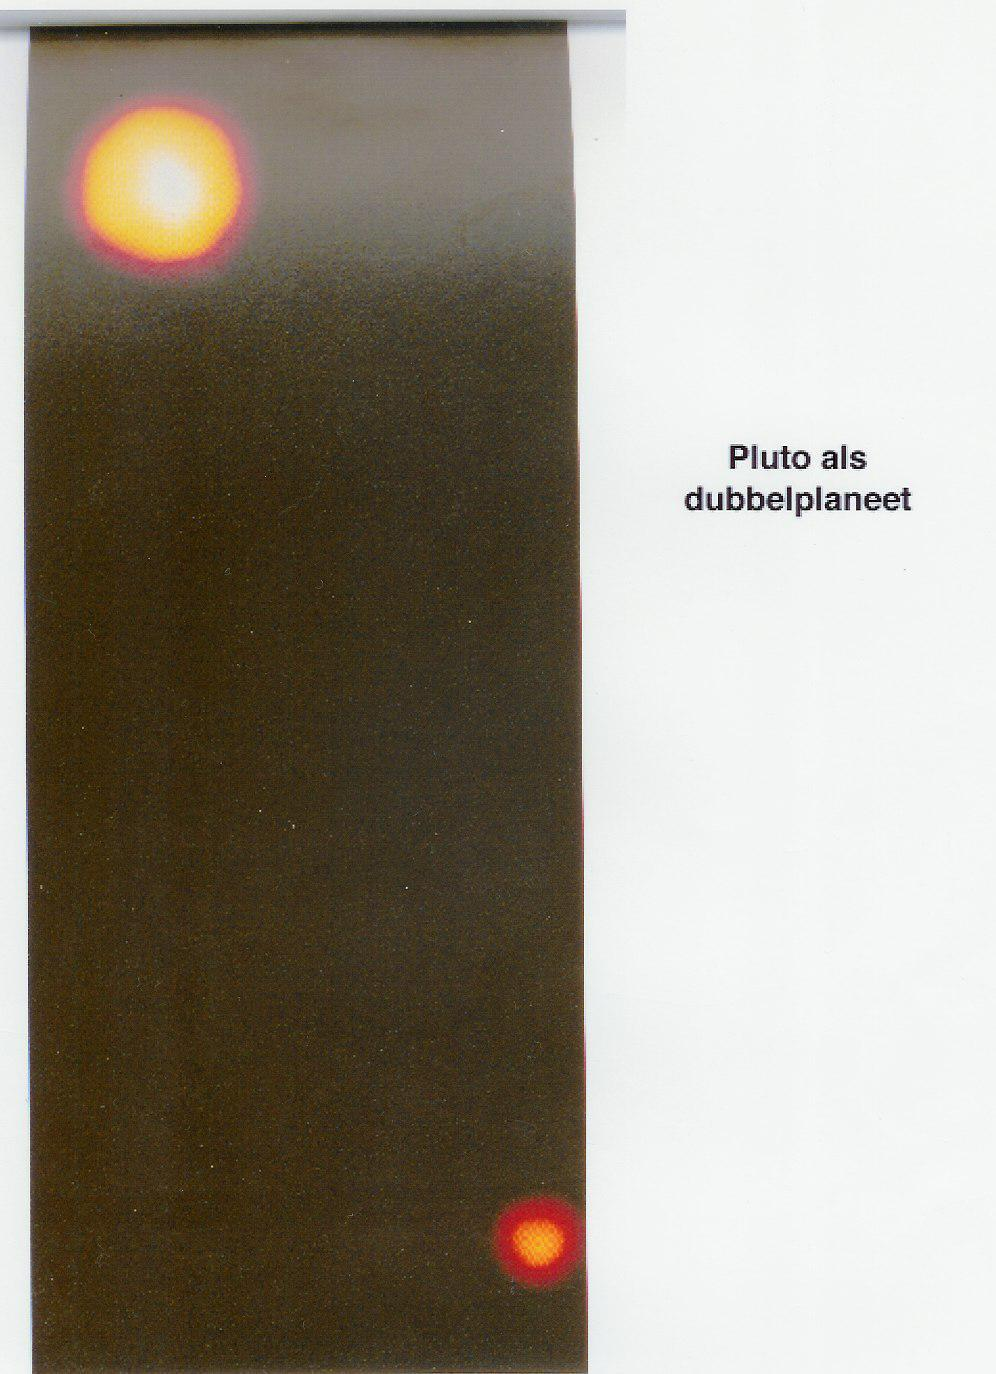 [19.Pluto+dubbelplaneet]